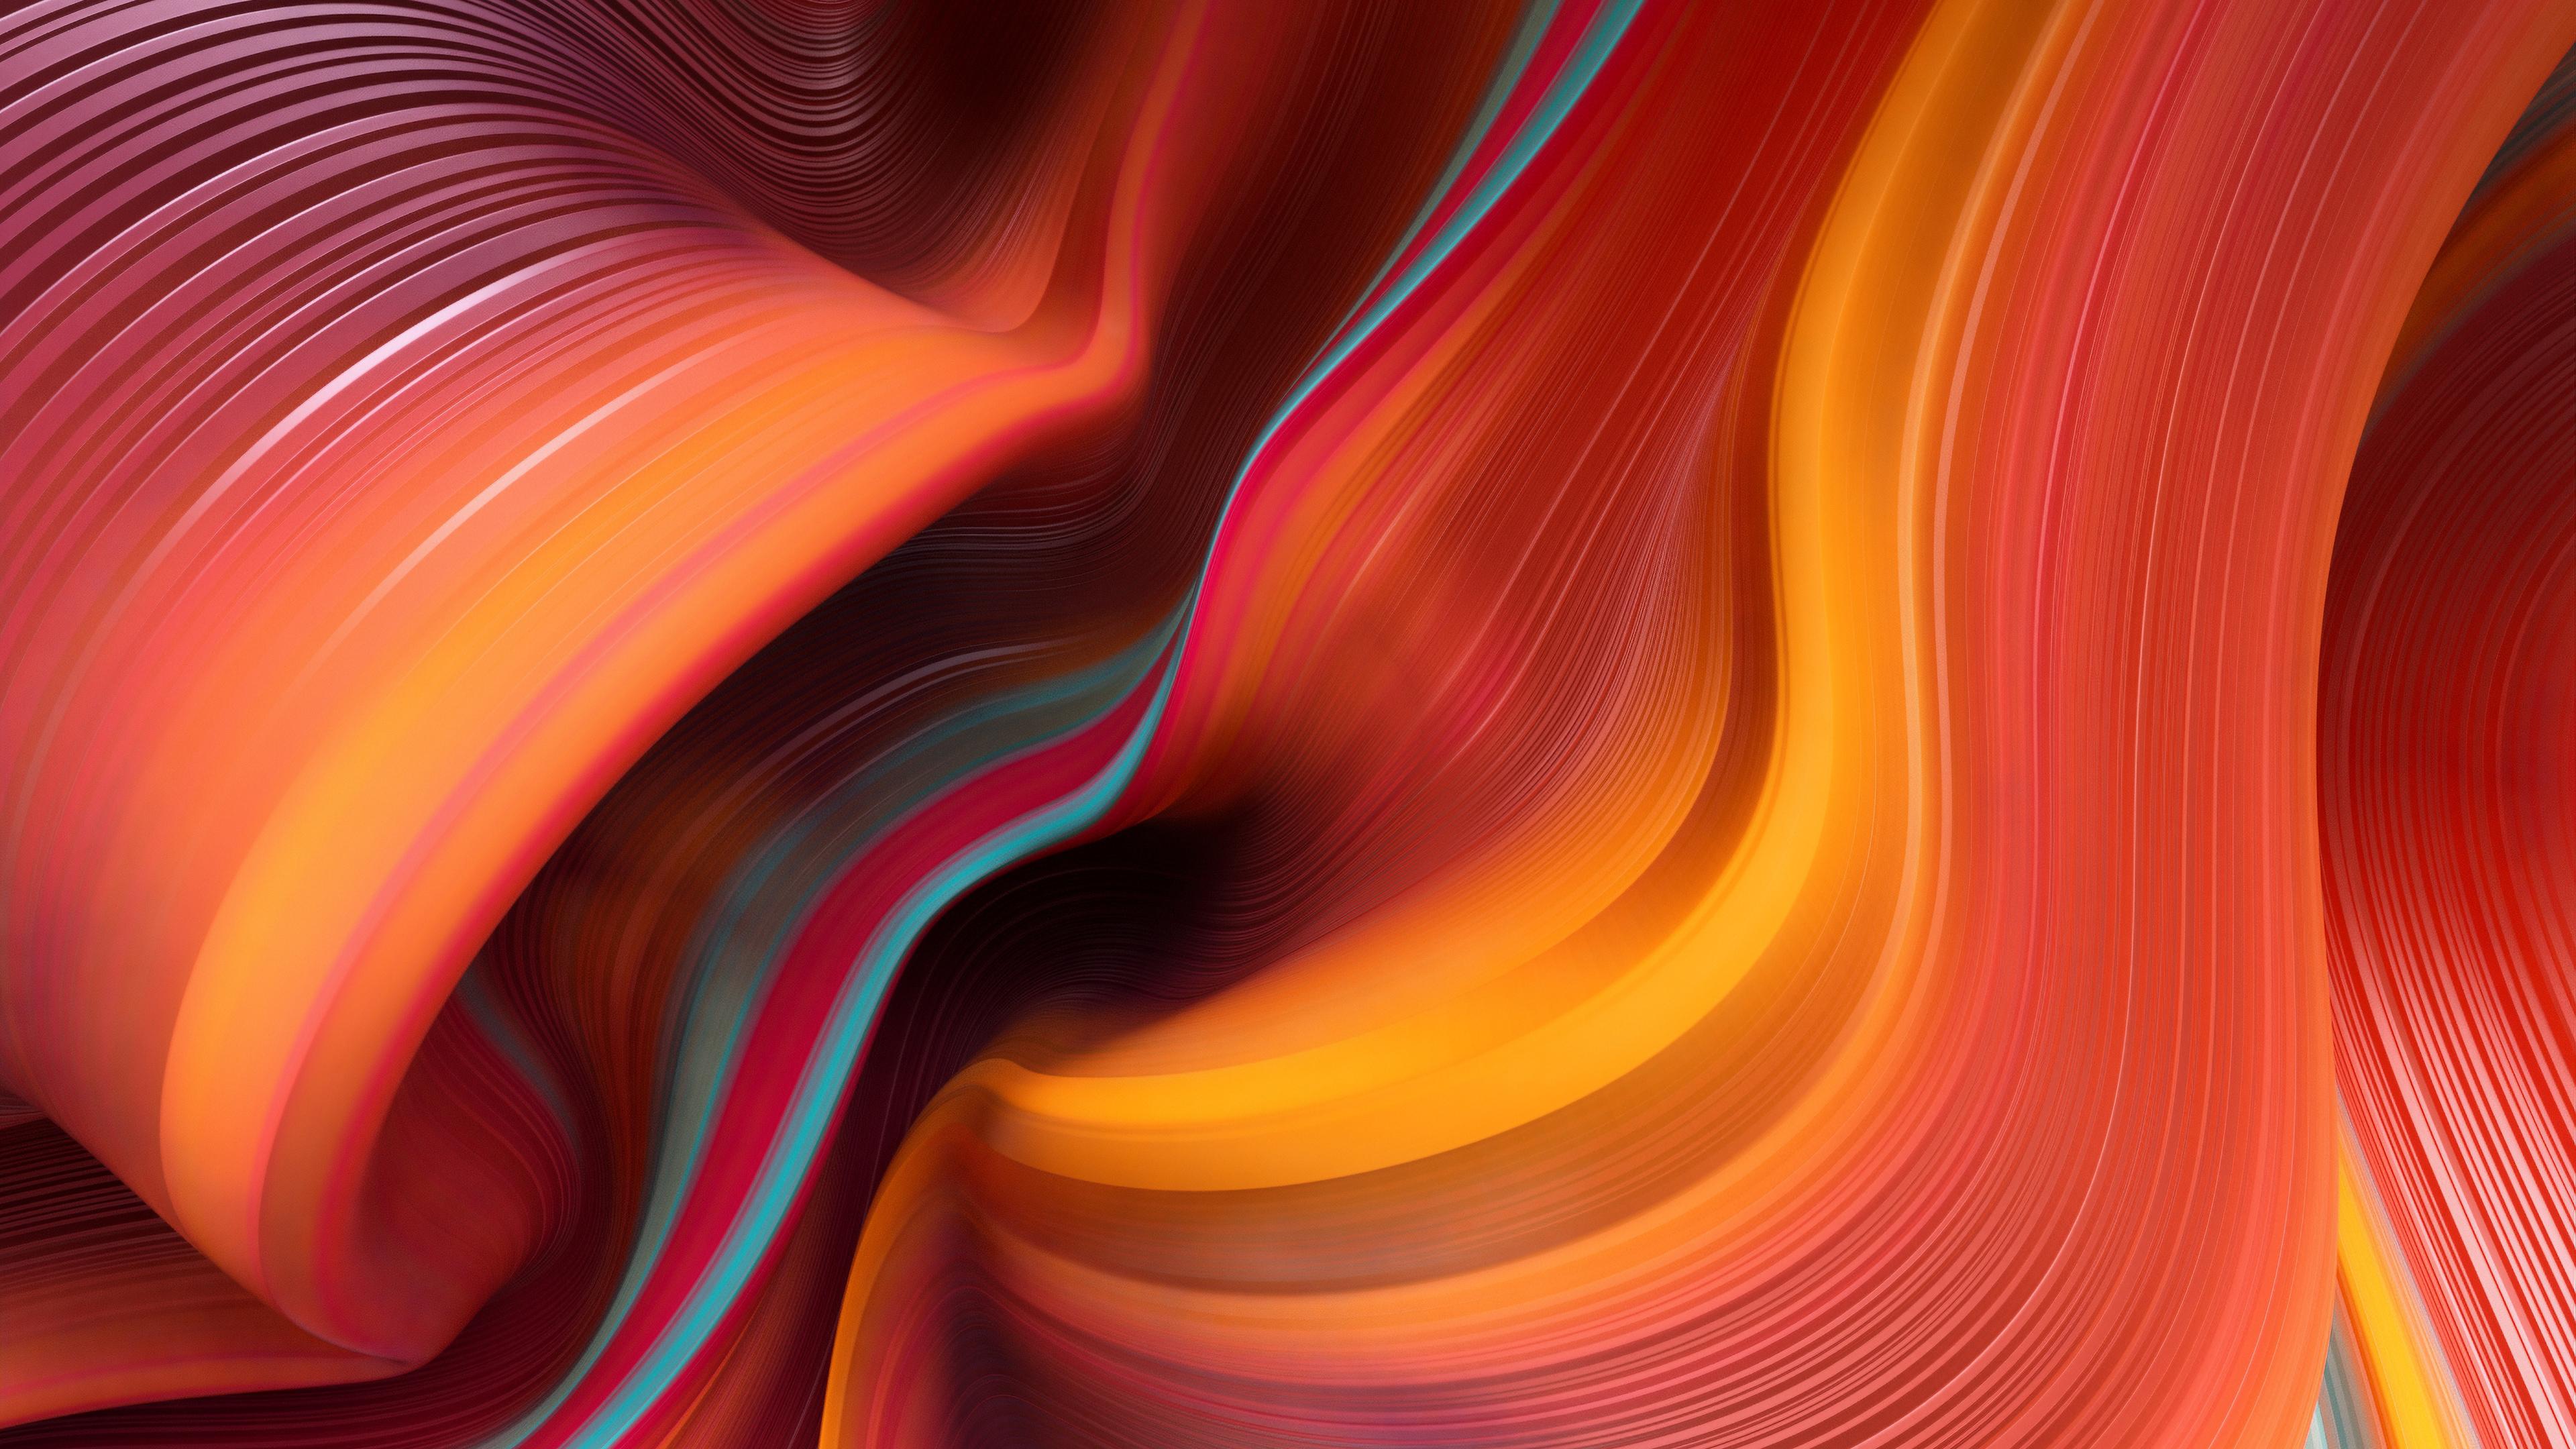 patterns and texture 1565056008 - Patterns And Texture - texture wallpapers, pattern wallpapers, hd-wallpapers, behance wallpapers, 4k-wallpapers